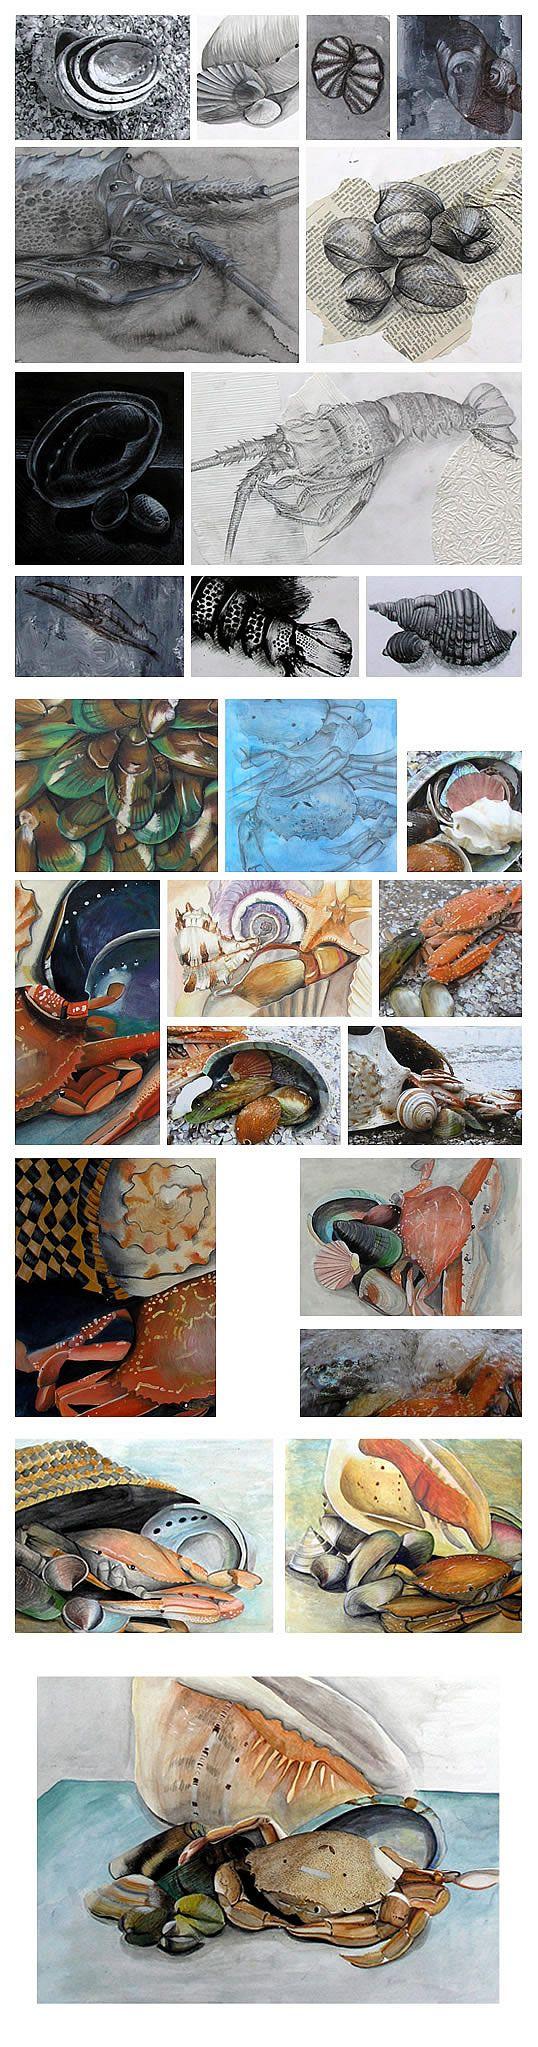 Natural Forms: A beautiful International GCSE Art Exam